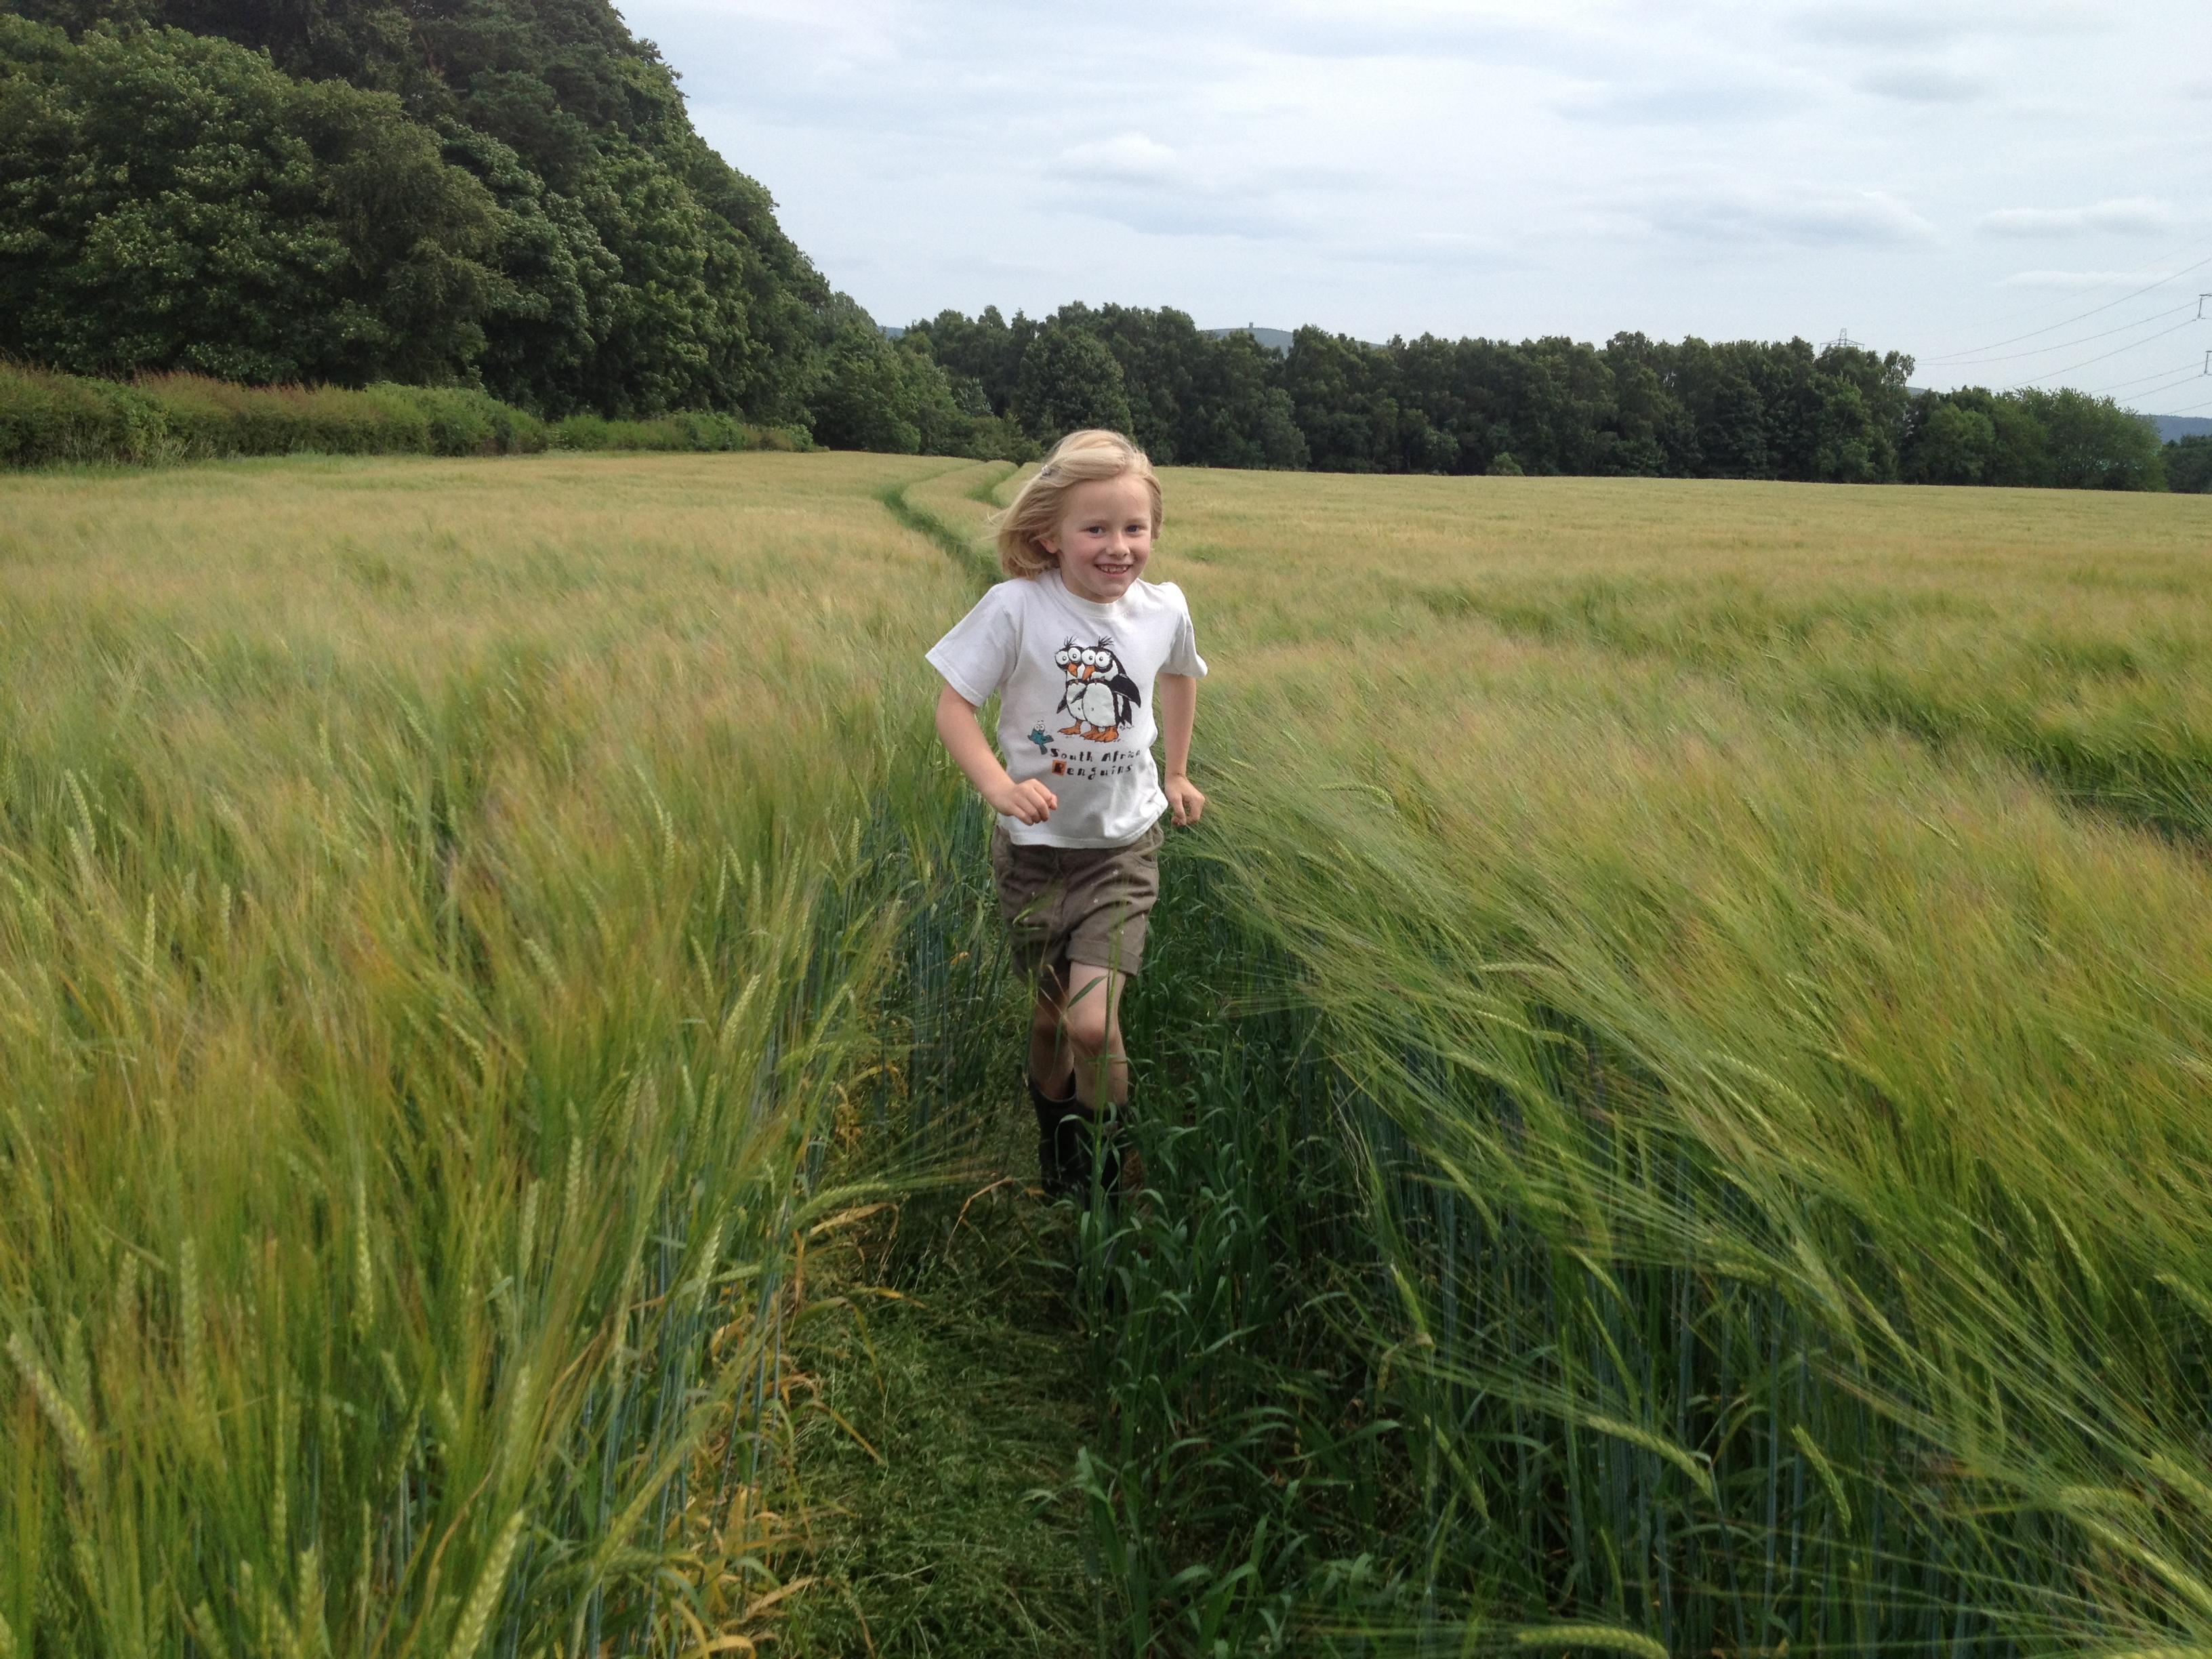 Daisy running through the fields